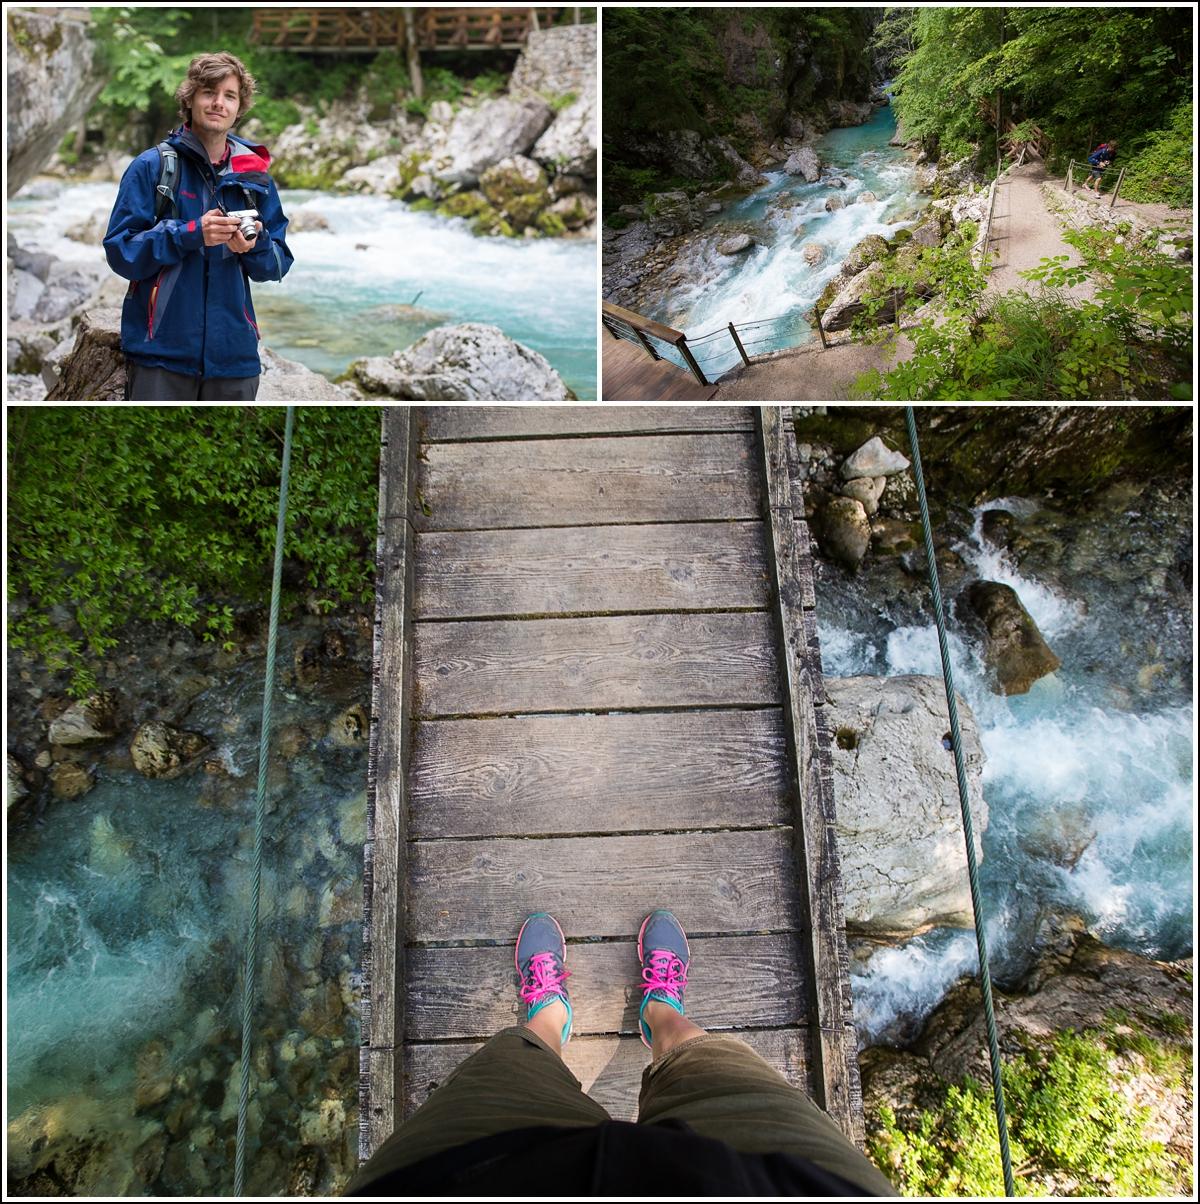 tolmin-gorges-bridge